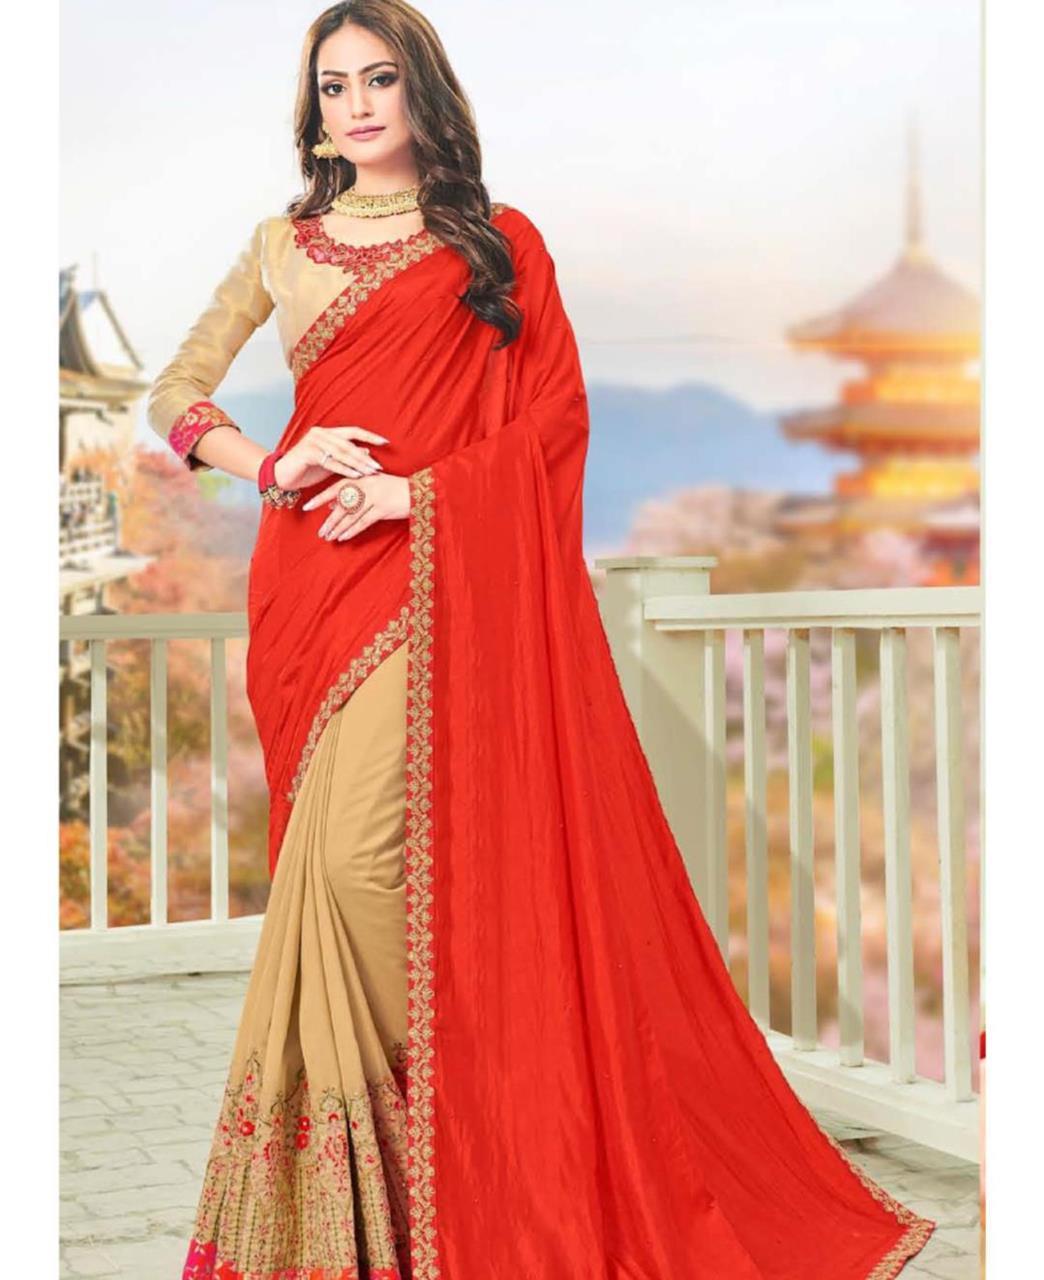 Embroidered Silk Saree in Beige-Red